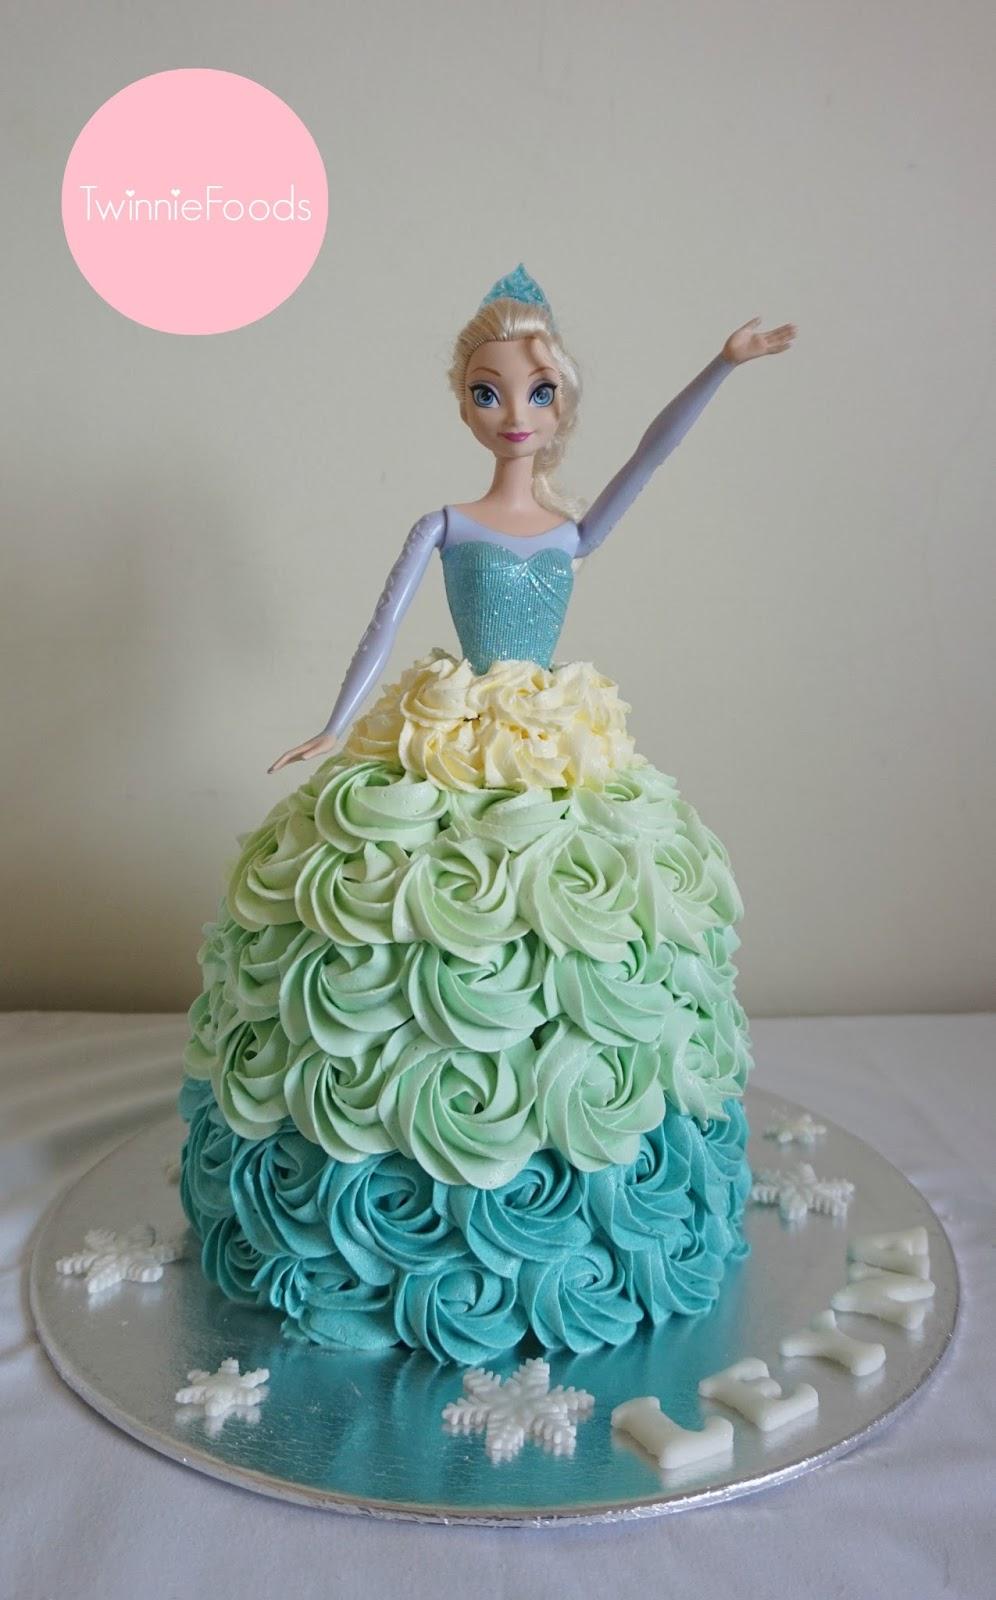 Elsa Doll Cake - TwinnieFoods